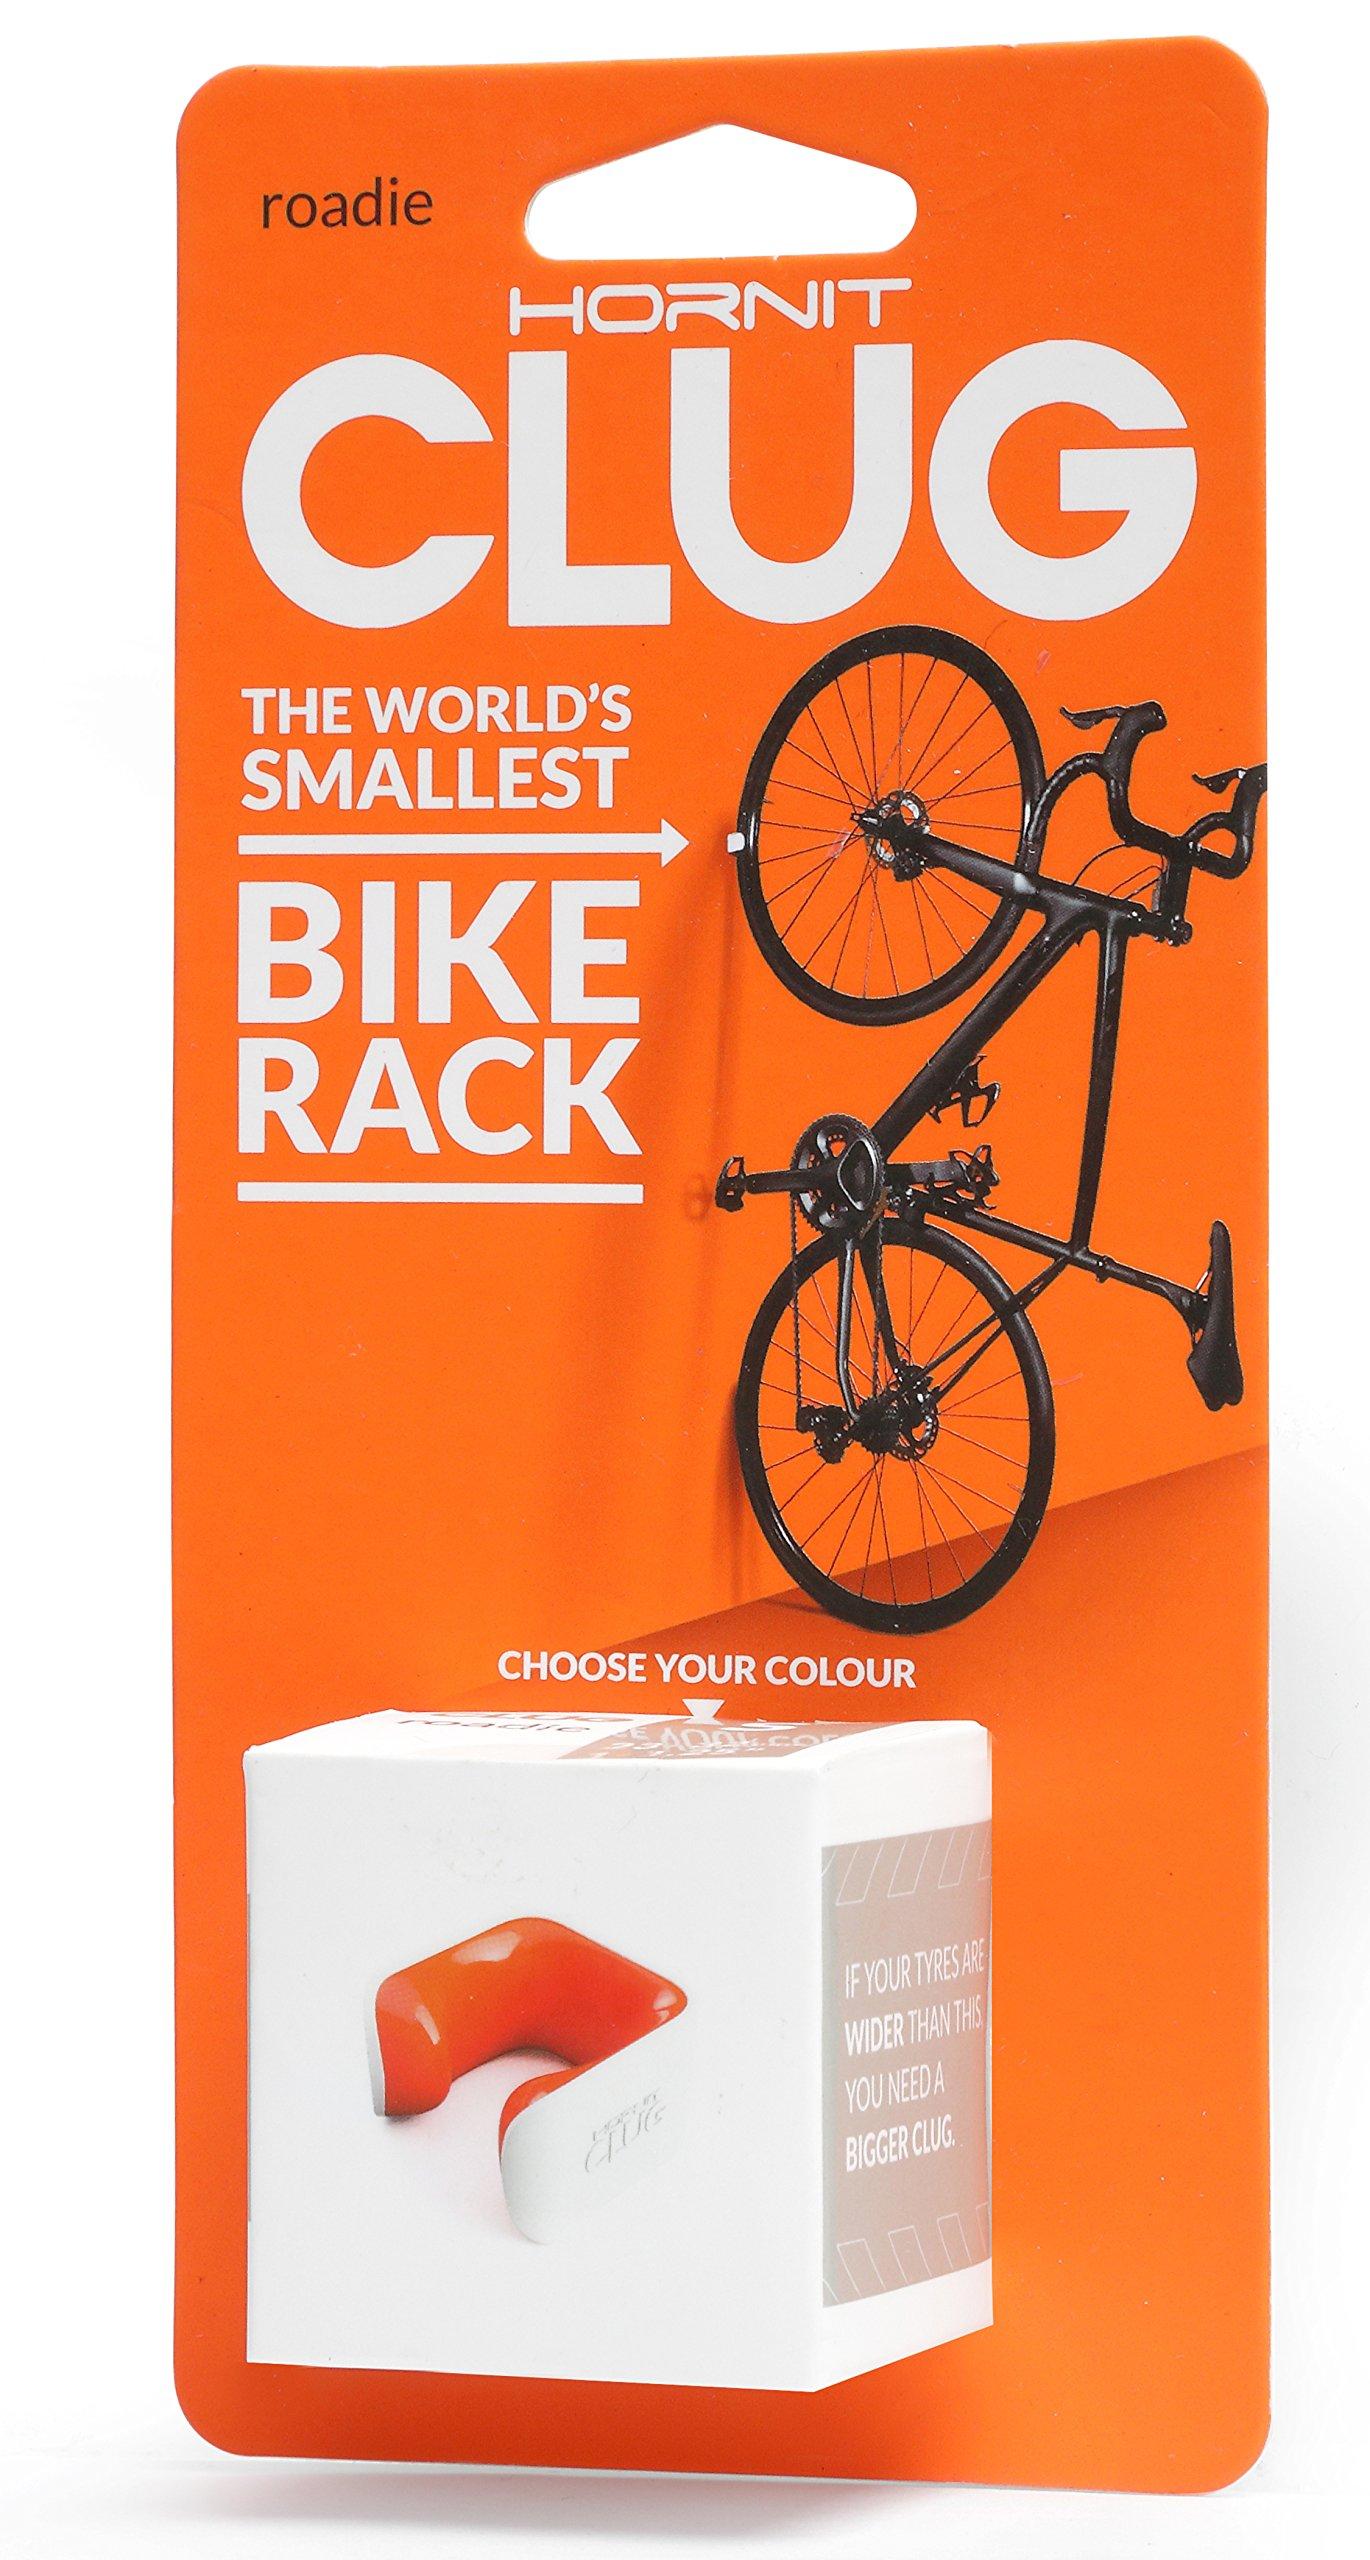 Clug Roadie - Aparcabici, Color Naranja, Talla S product image